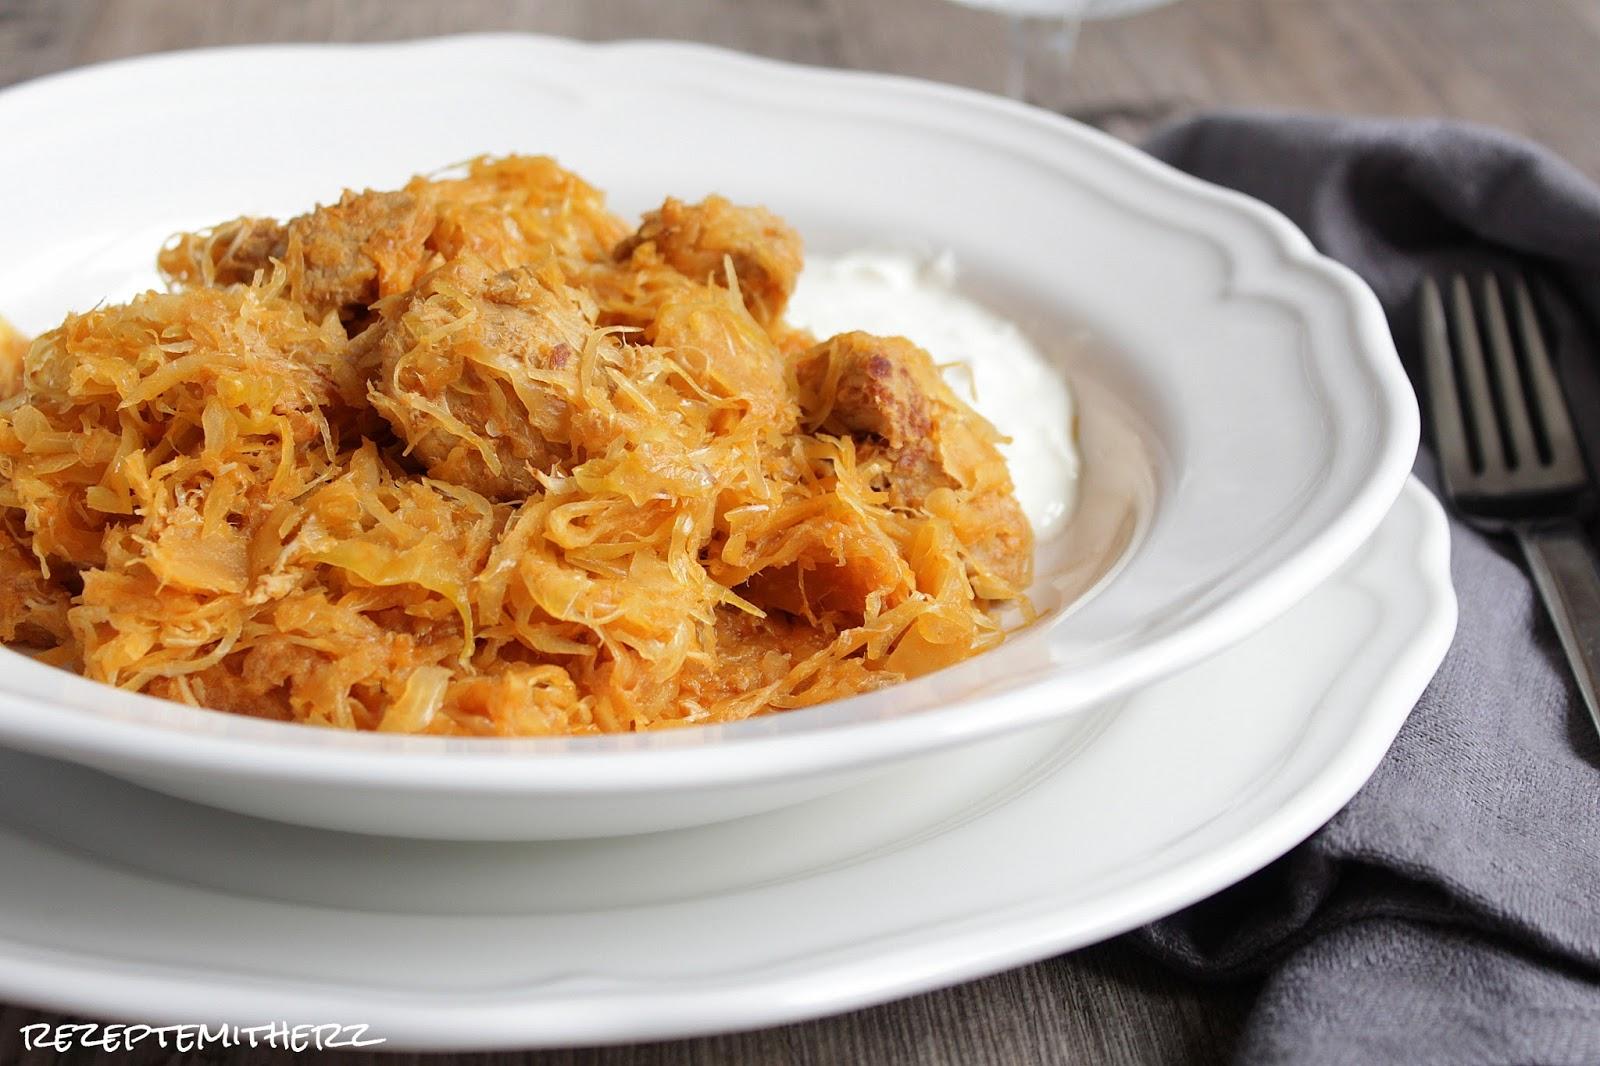 Rezepte mit herz szegediner gulasch seelenw rmer f r for Gewurze fur gulasch